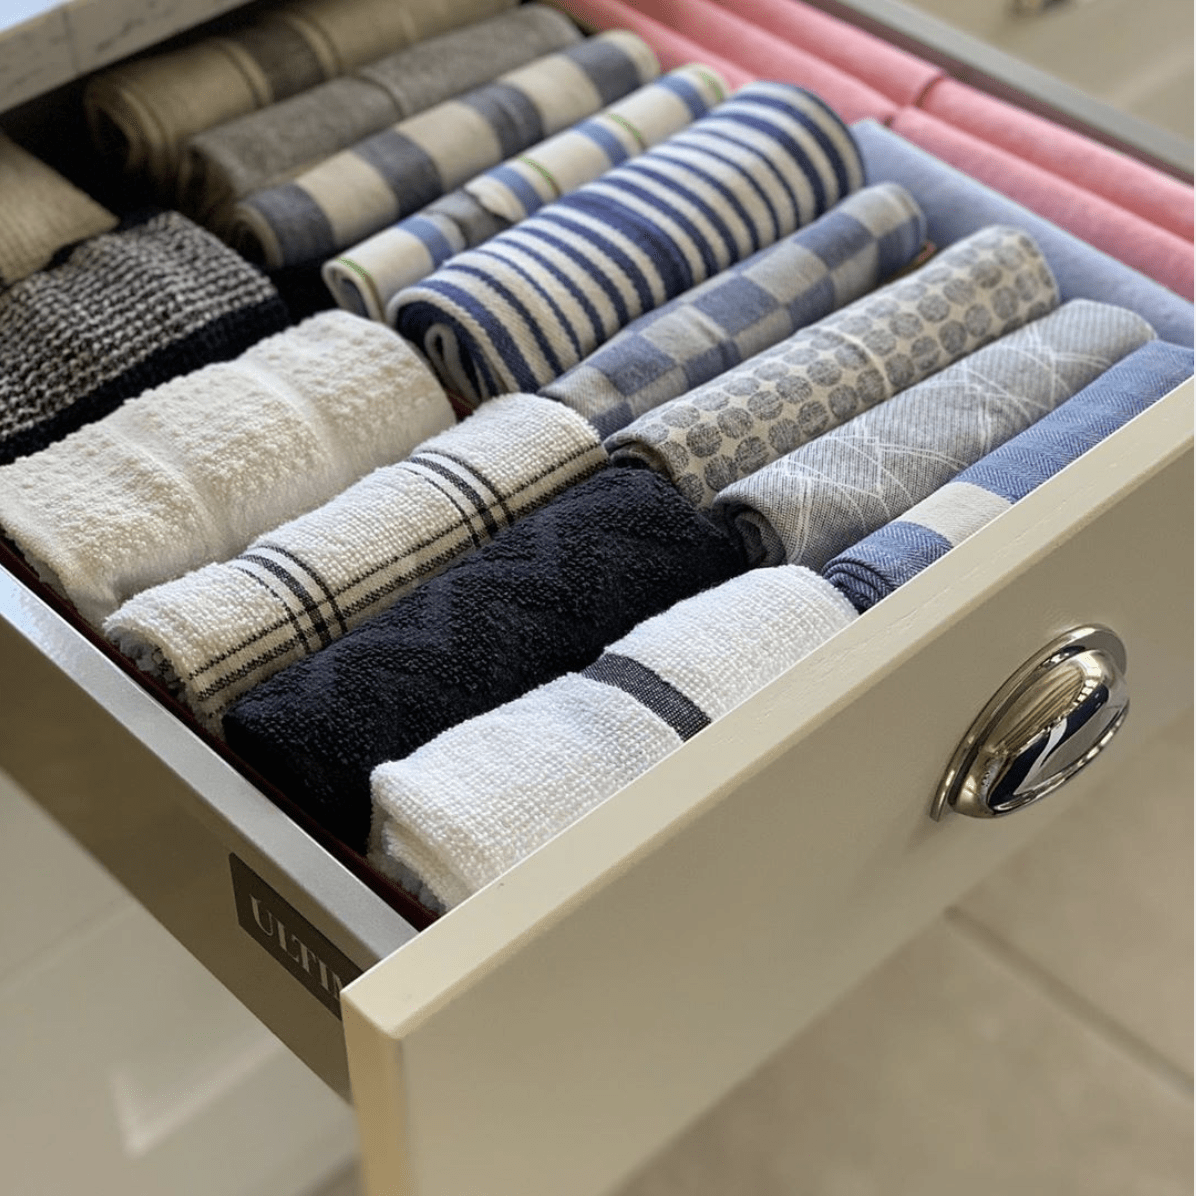 kitchen towels organized with the Konmari folding method